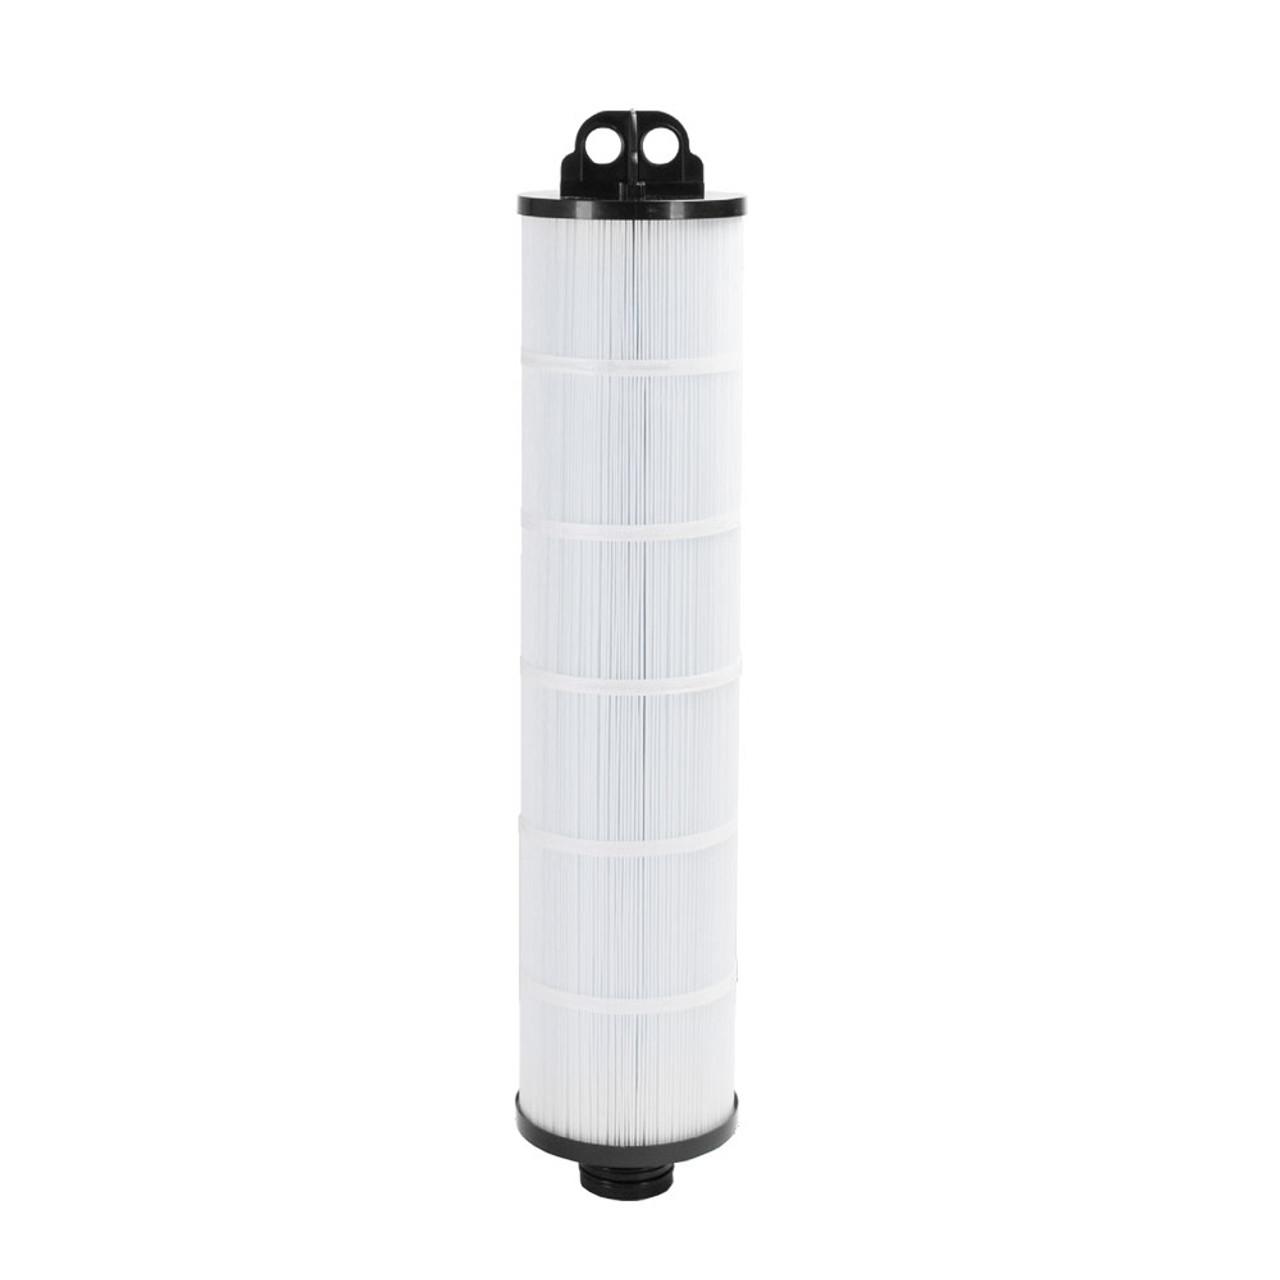 HydroScientific HBBC-150-P50 Pleated Big Flow Filter Cartridge 50 Micron